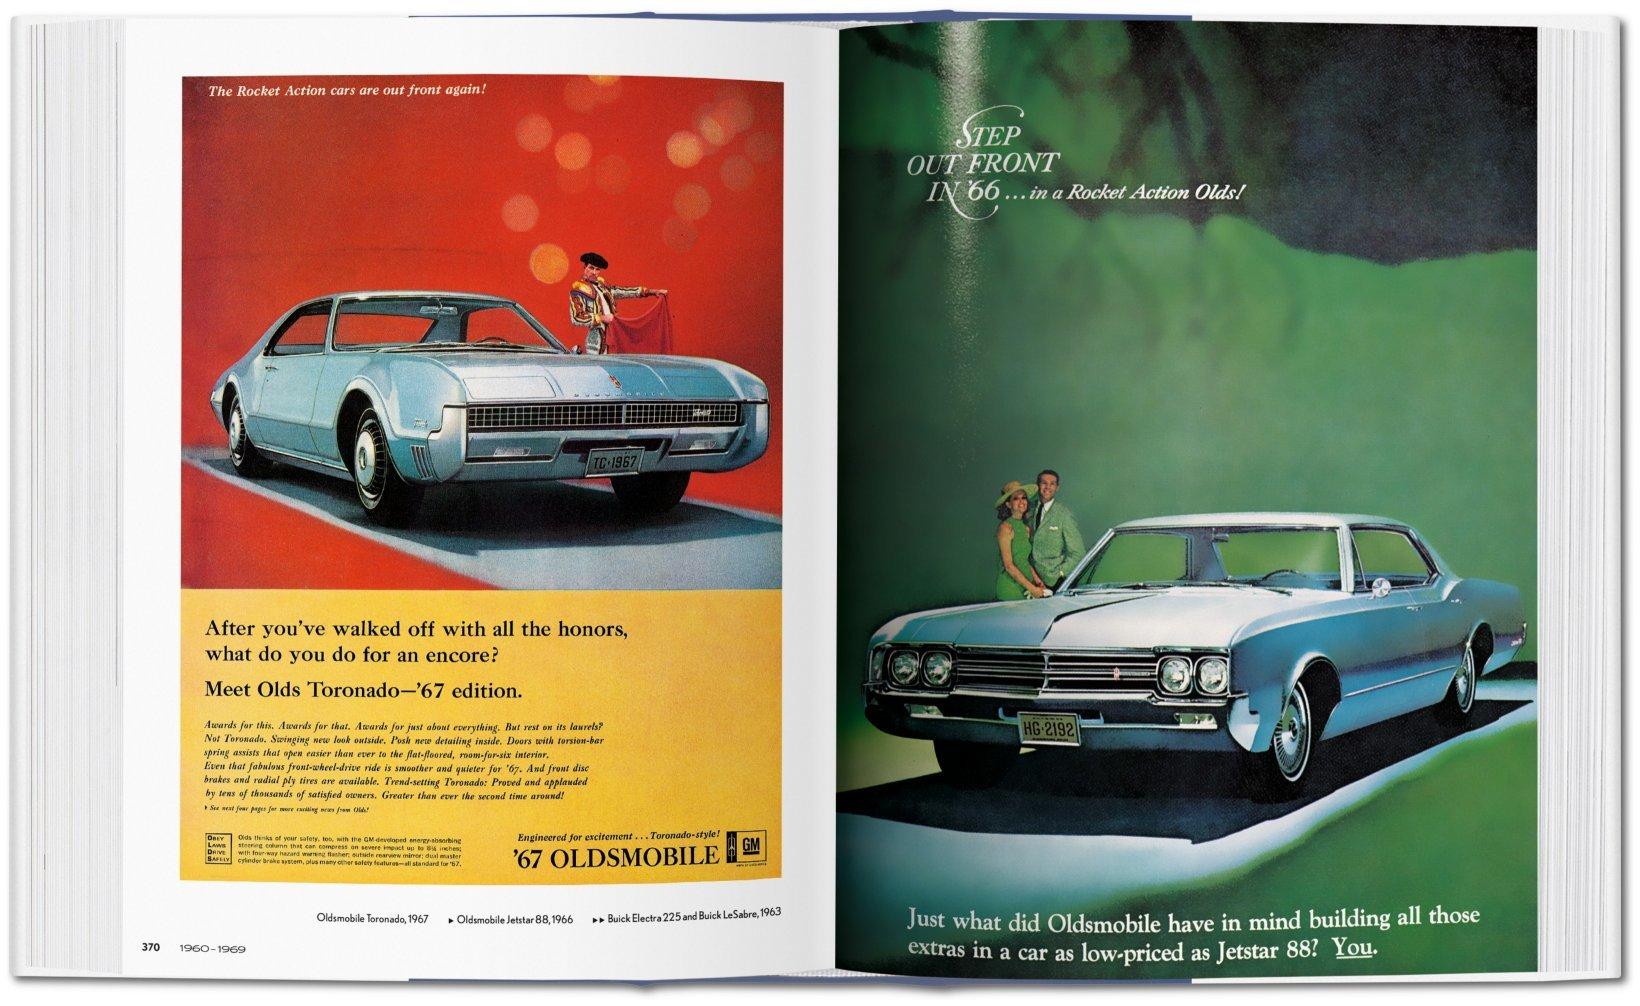 classic_cars_20th_cent_hc_ko_int_open_0370_0371_05414_1507291133_id_675287